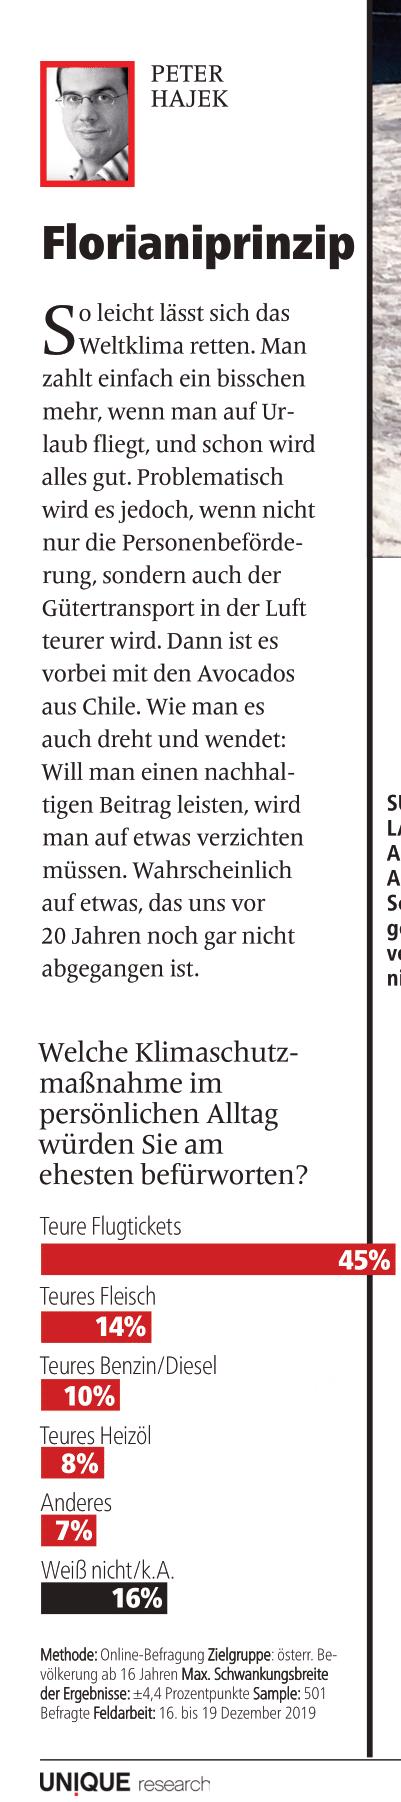 unique research peter hajek josef kalina umfrage klimaschutz